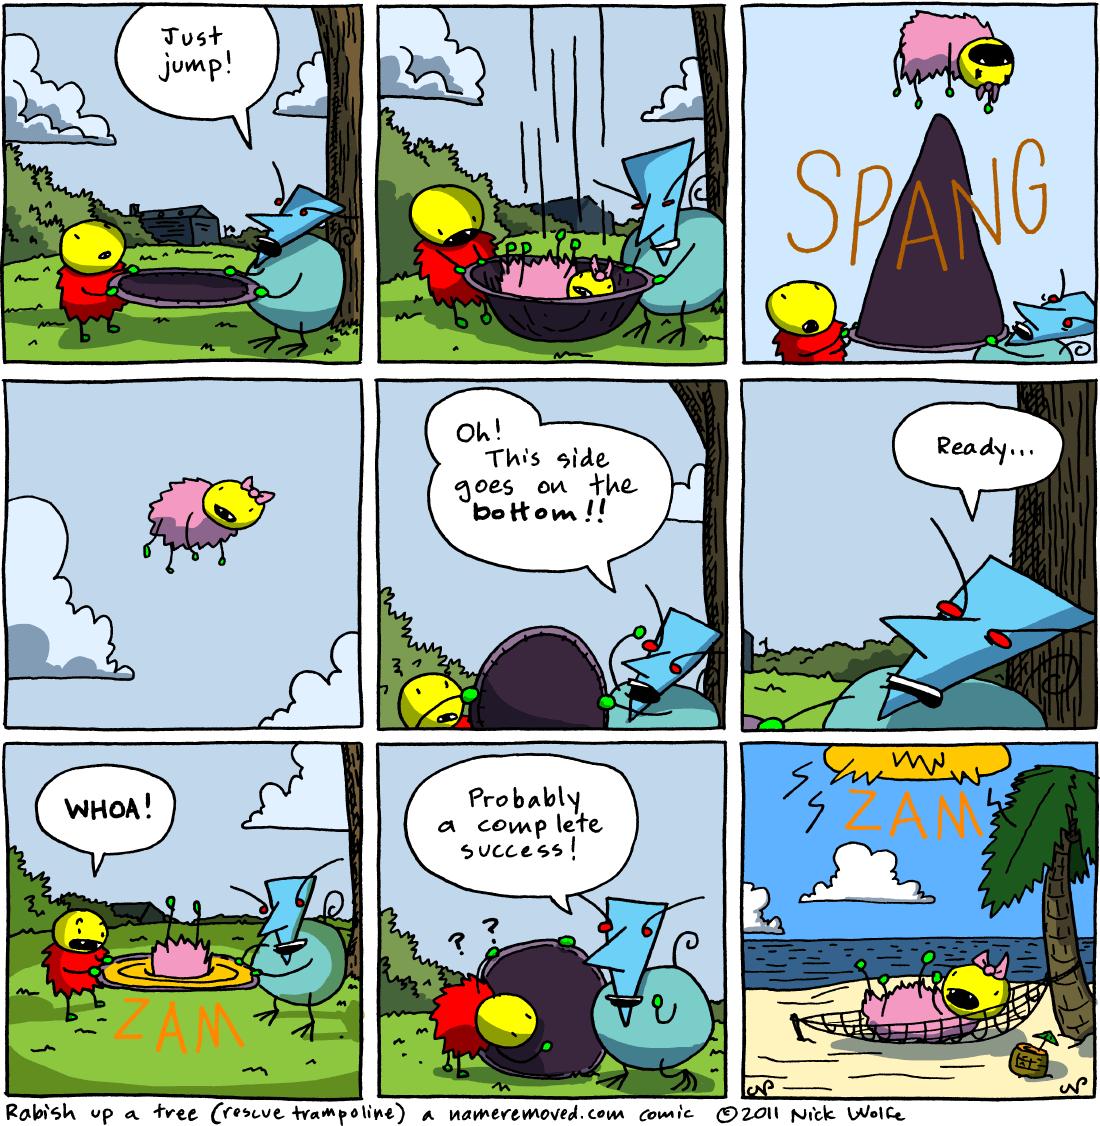 Rabish up a tree (rescue trampoline)